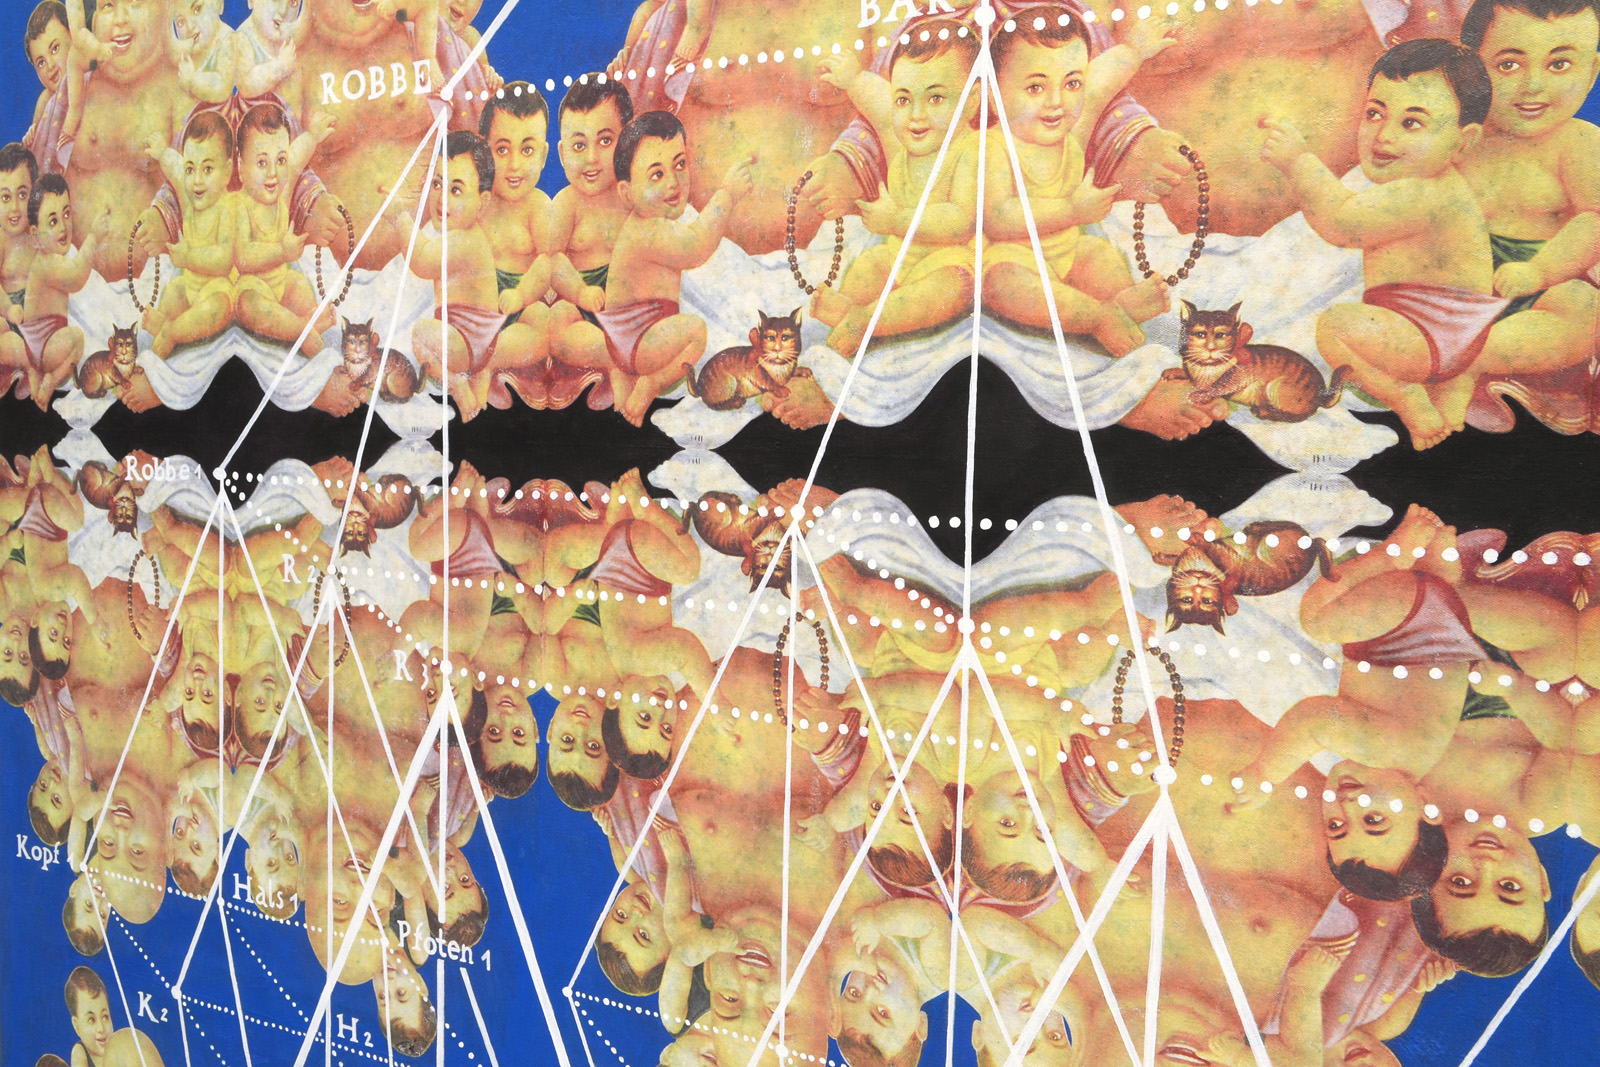 Michel Aniol Welt Idiotikon Berlin Kunst Art Malerei Painting